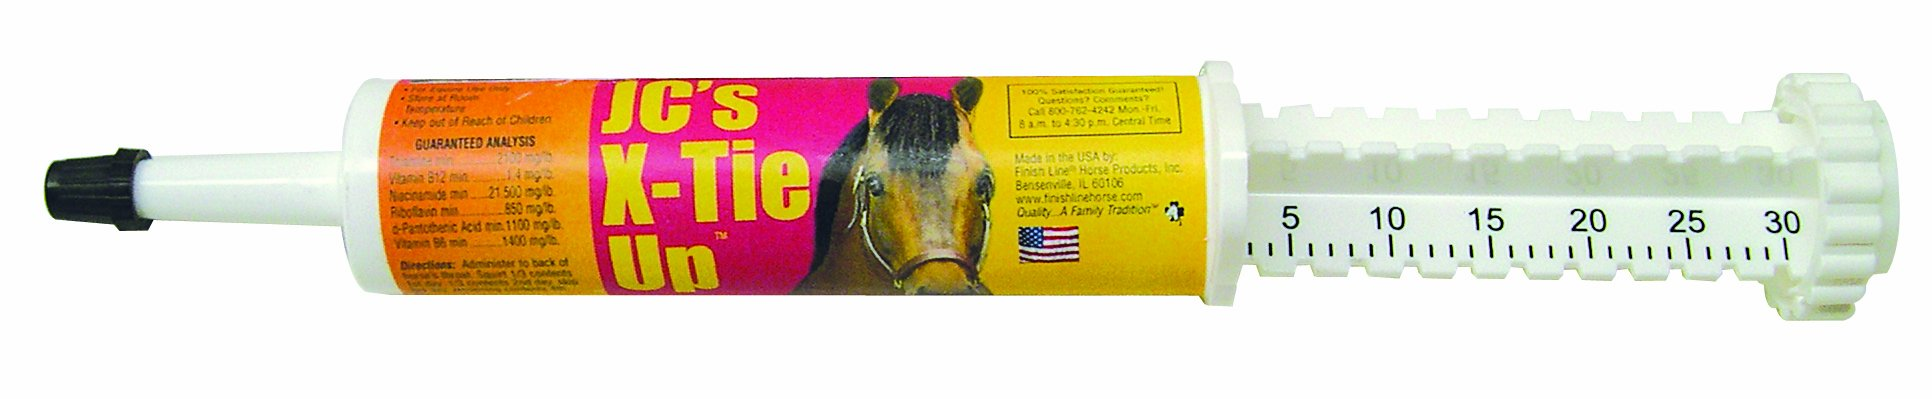 Finish Line Horse Products J.C' S X Tie Up (Syringe)